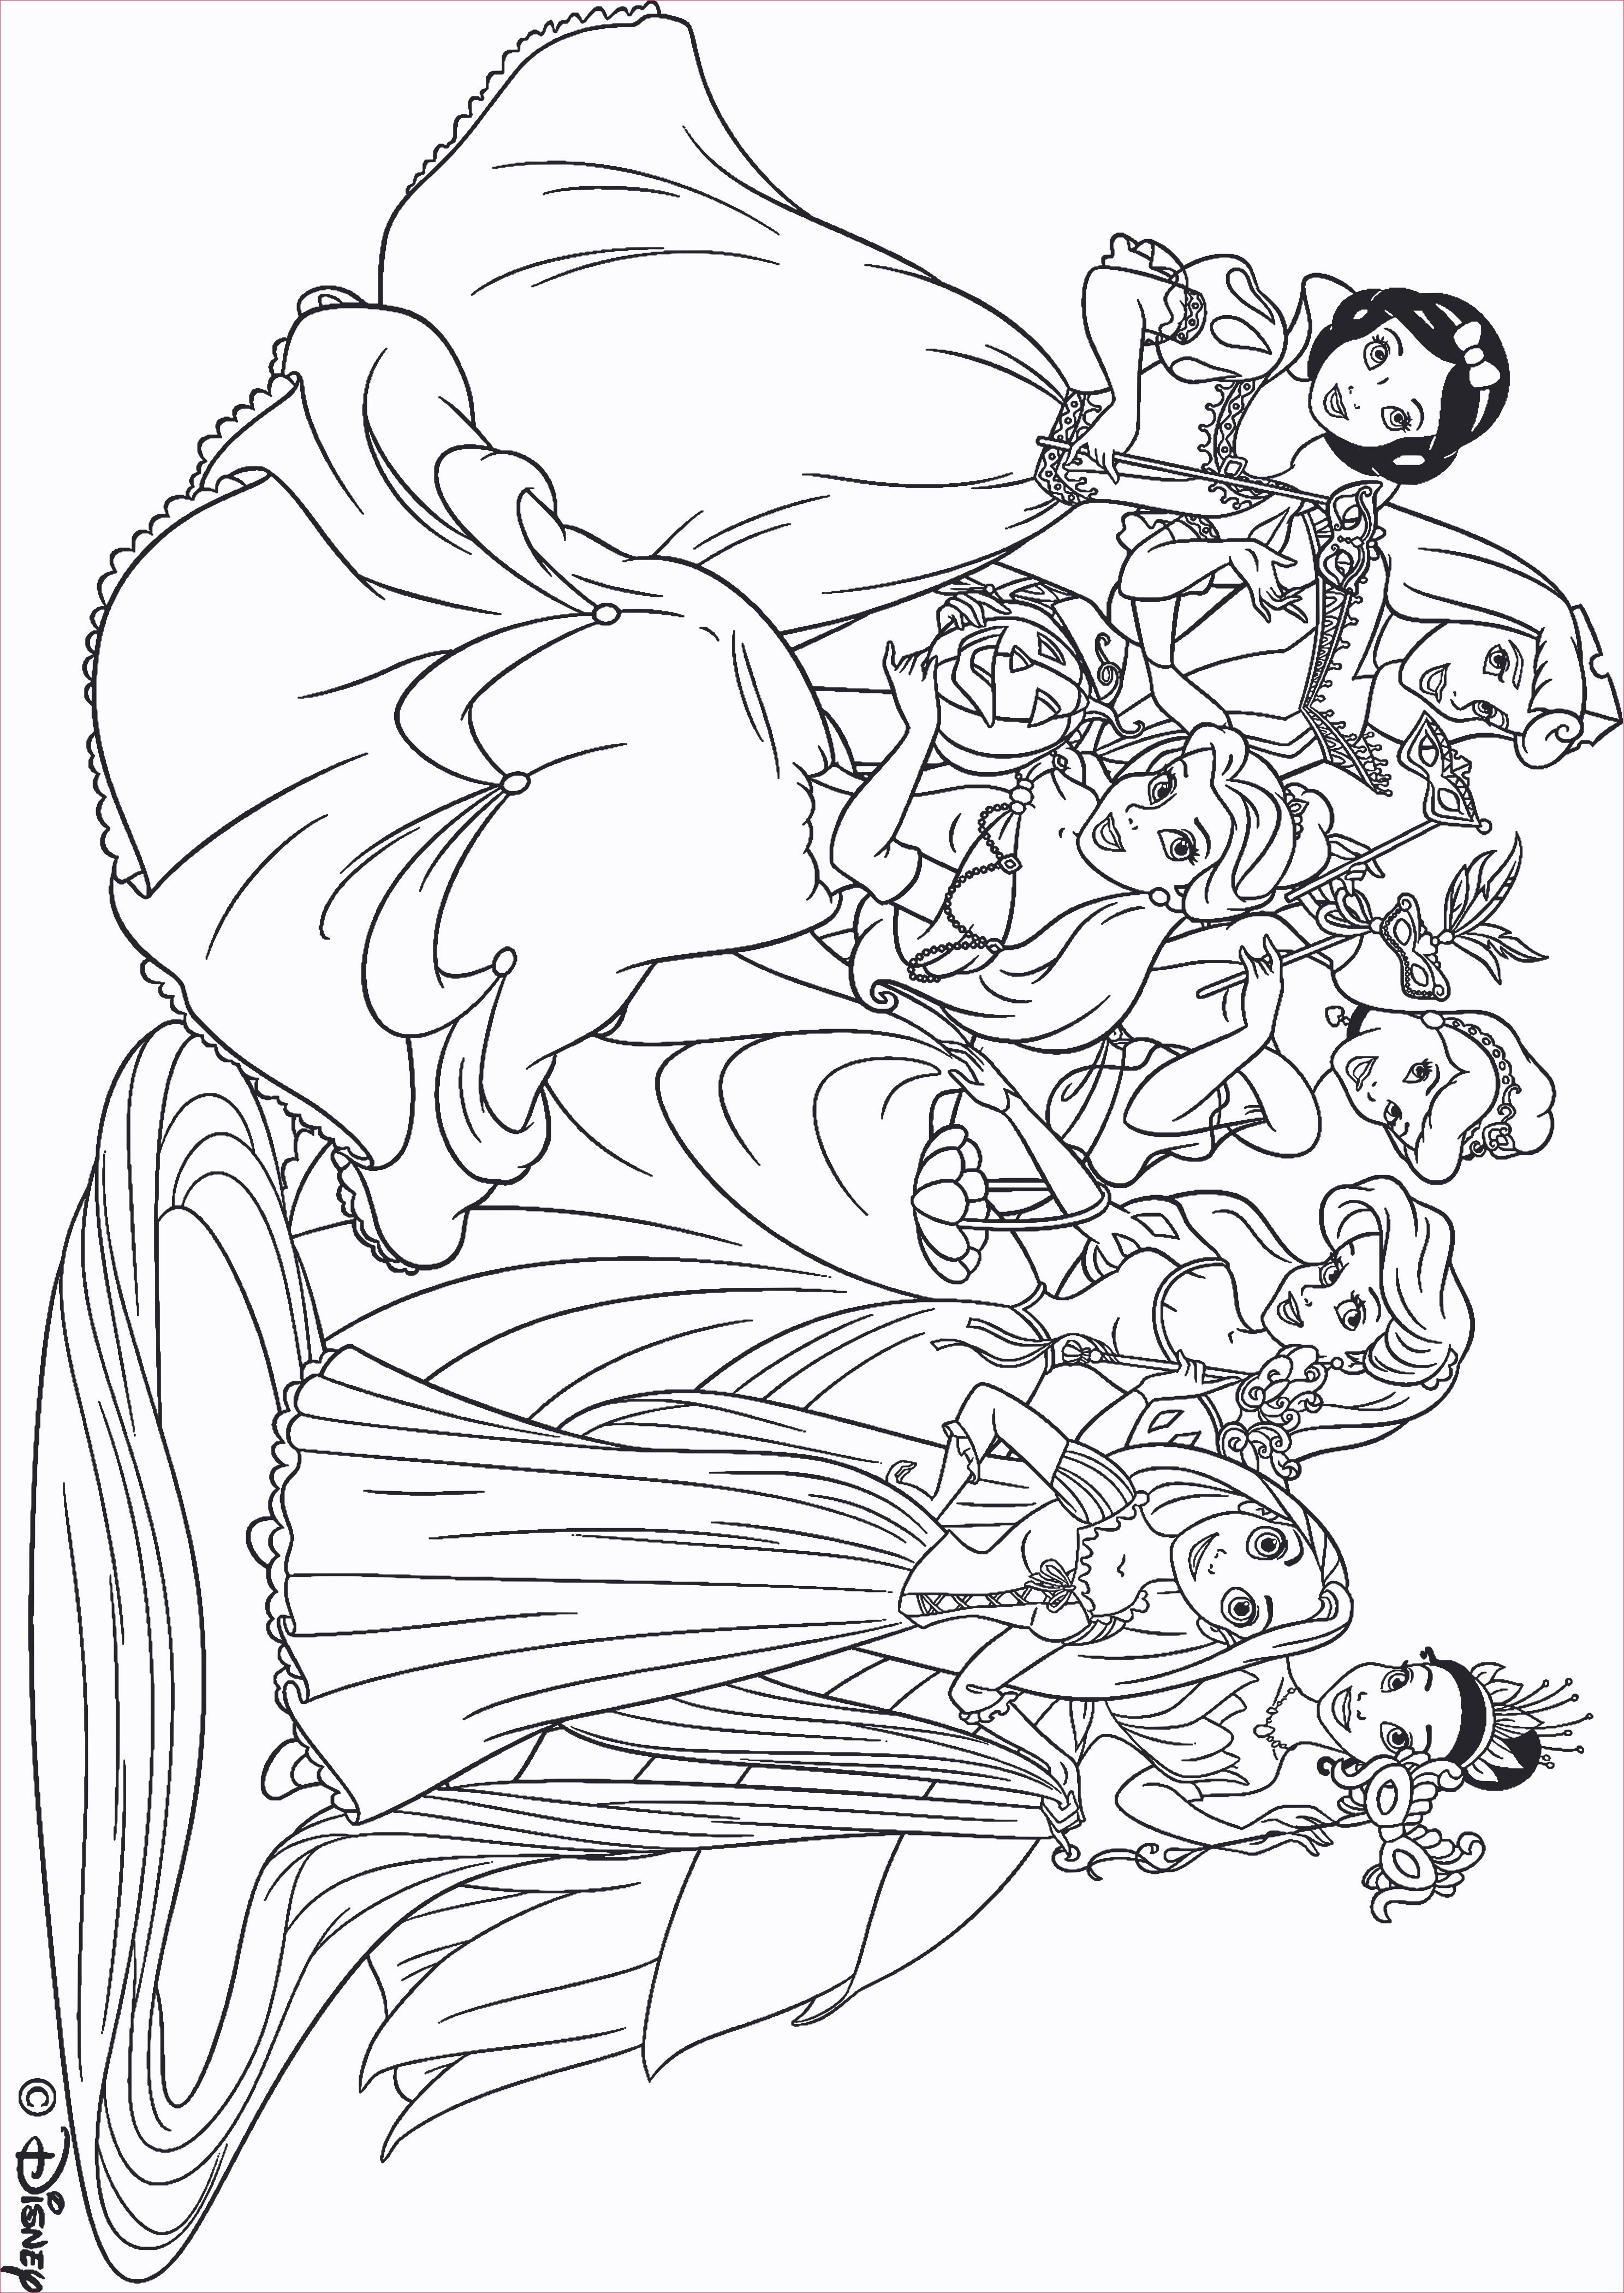 Ausmalbild St. Martin Genial St Martin Ausmalbilder Model Designs 37 Disney Ausmalbilder Zum Galerie